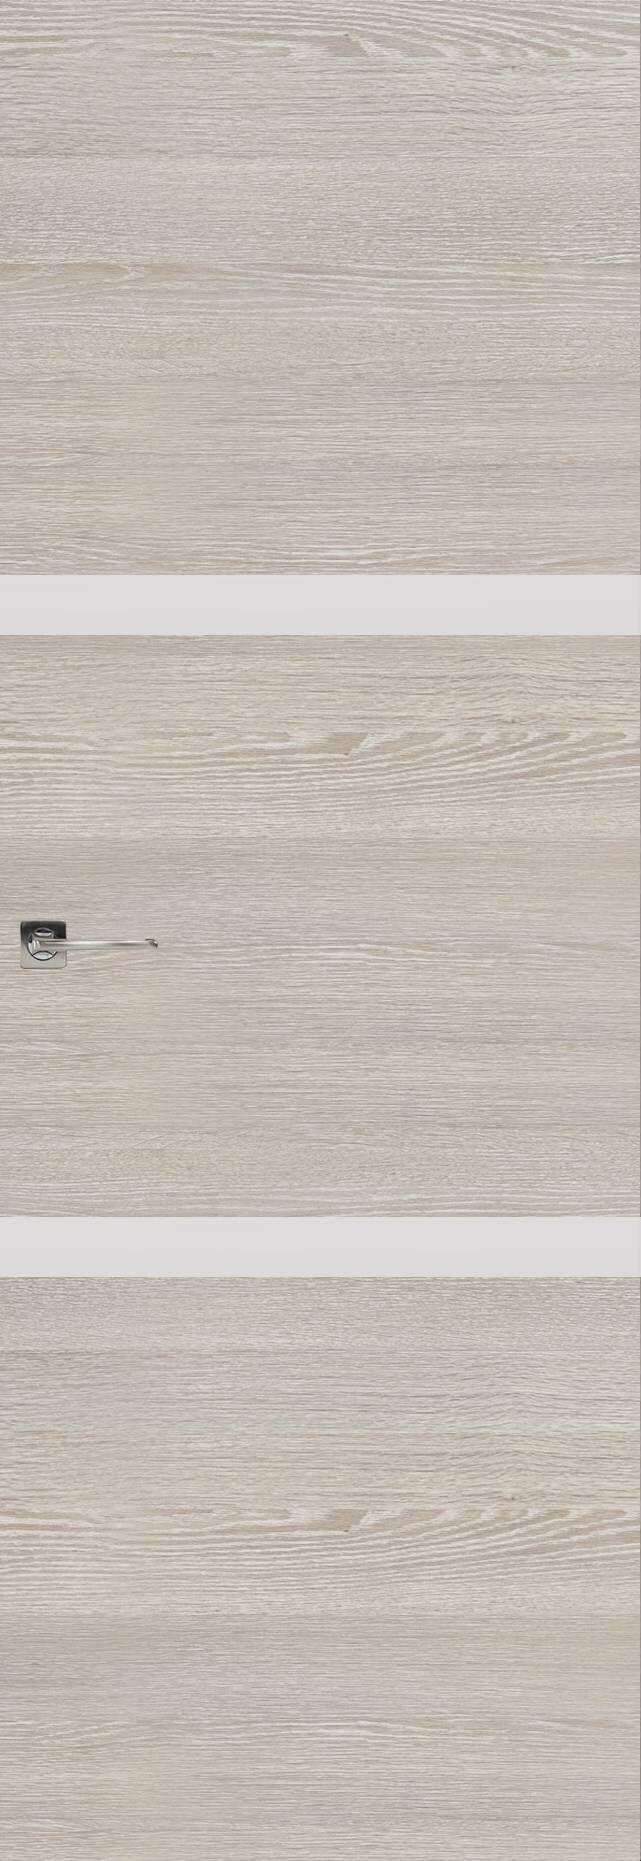 Tivoli В-4 Invisible цвет - Серый дуб Без стекла (ДГ)